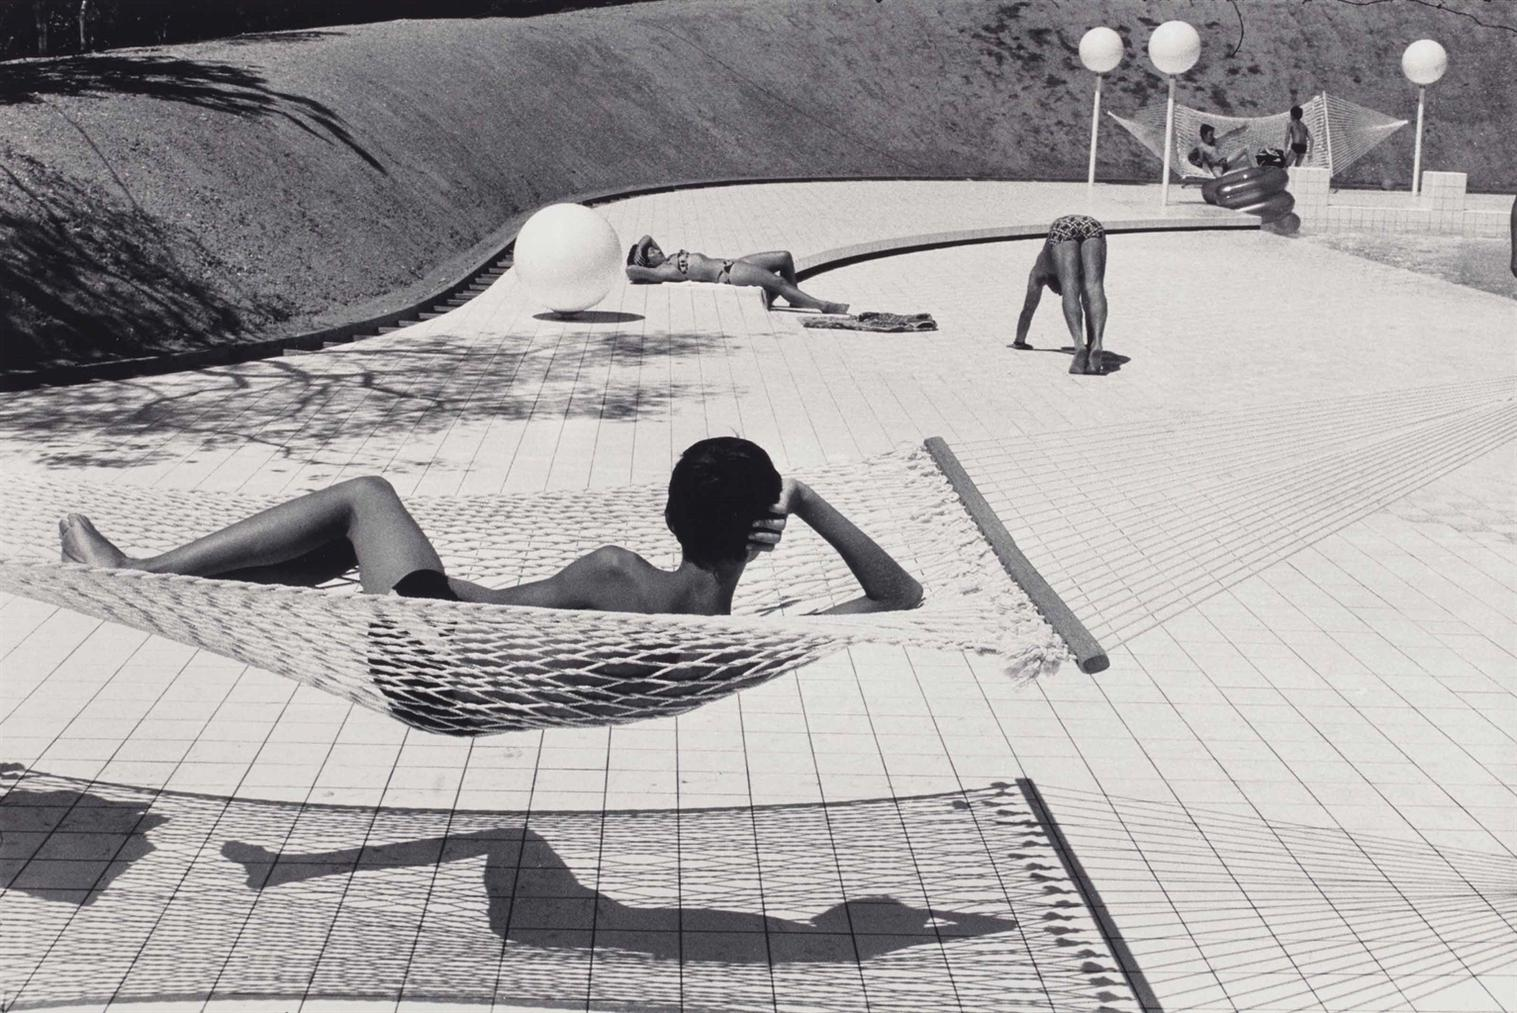 Martine Franck-Piscine Dessinee Par Alain Capeilleres, La Brusc, France-1976